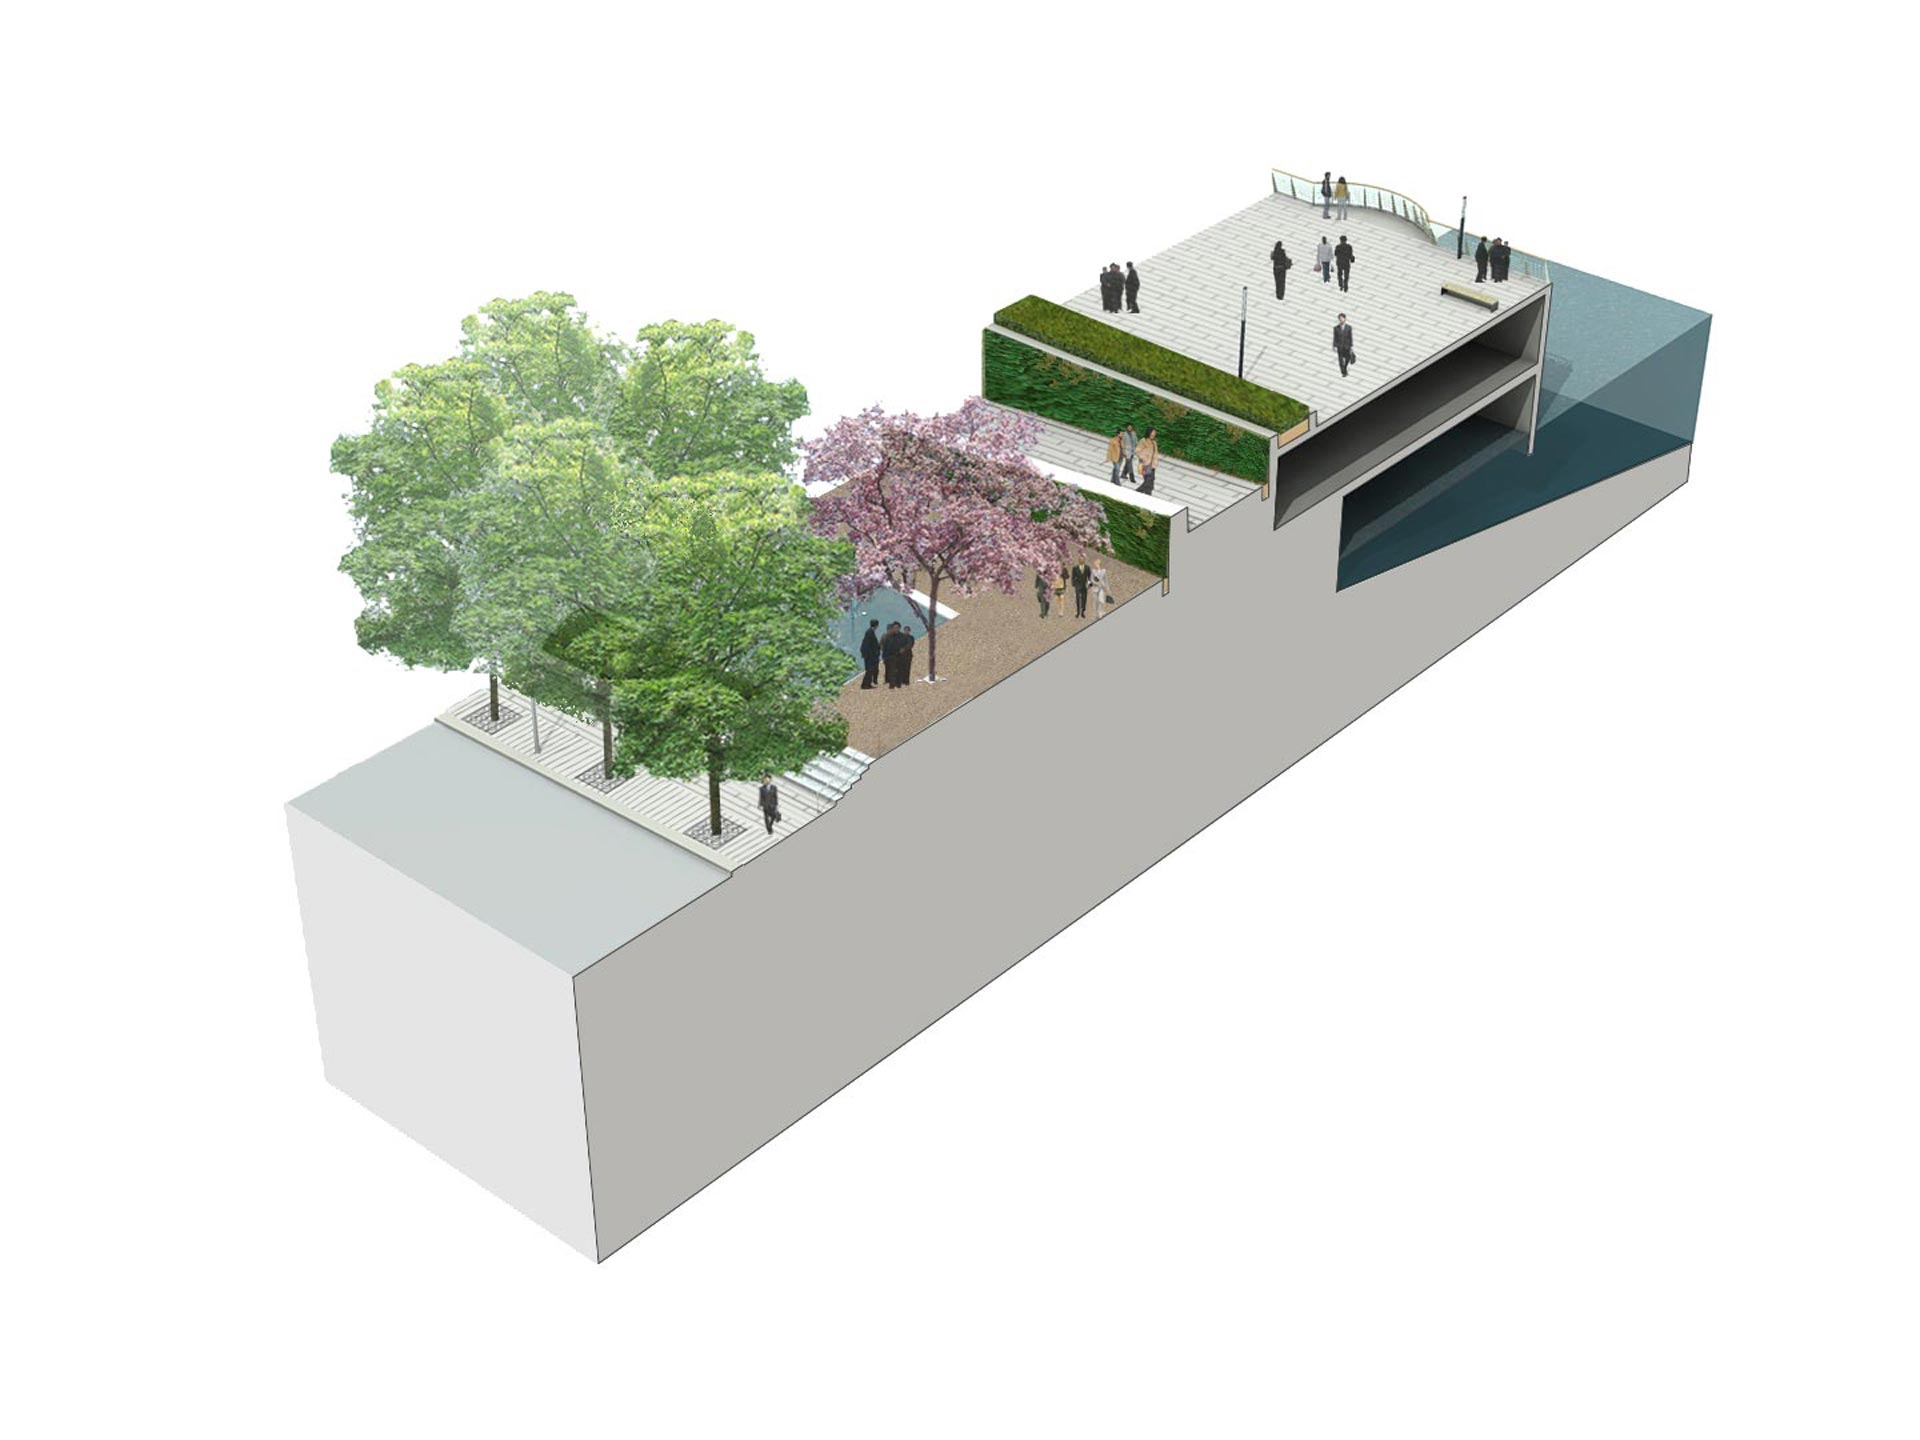 6_Shanghai-Bund_Klopfer-Martin-Design-Group_axonemetric_rendering_riverfront.jpg